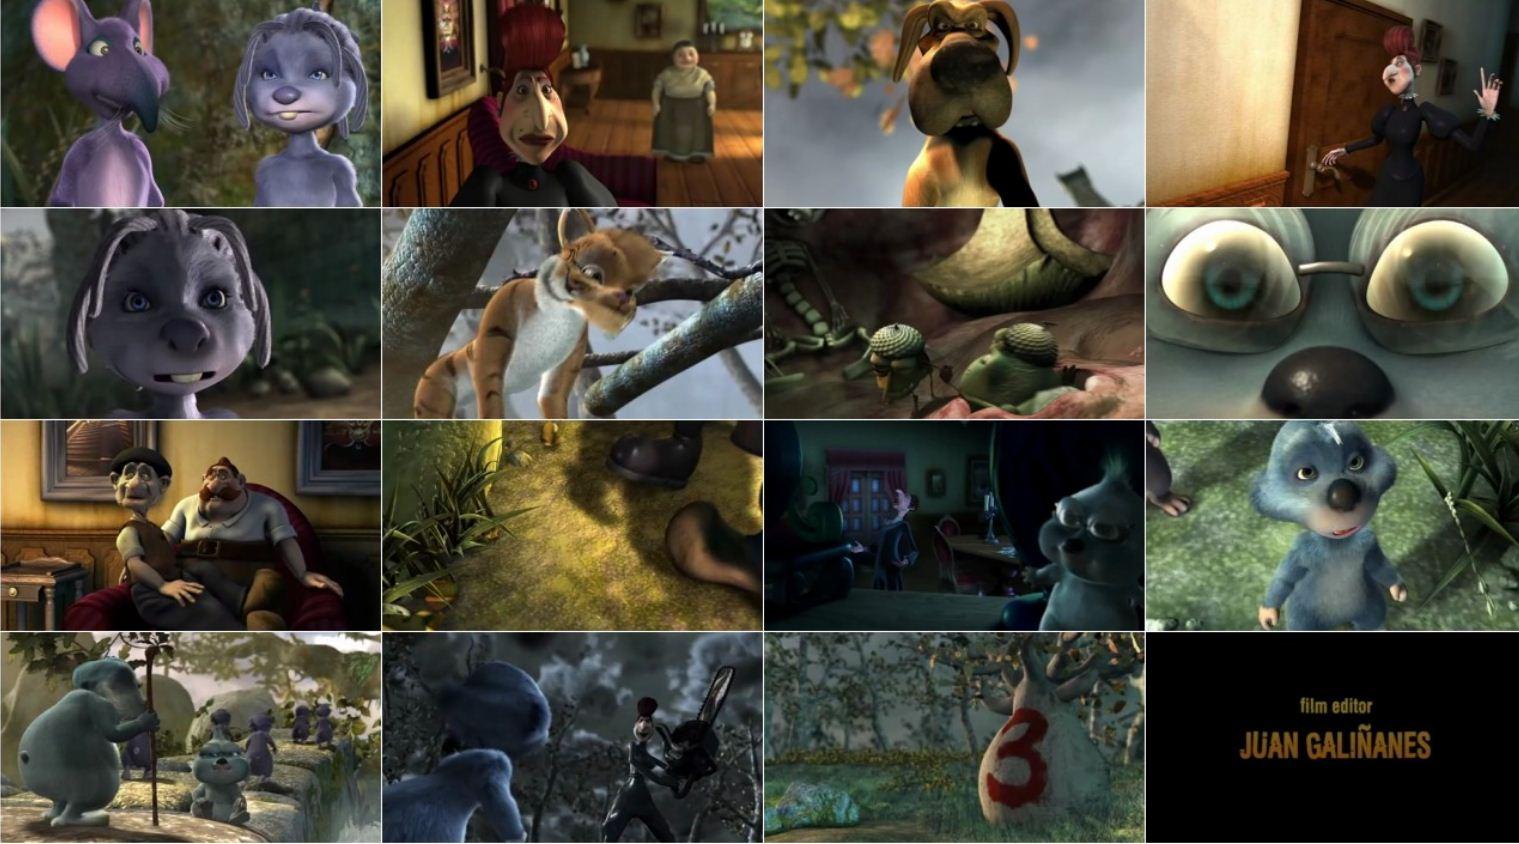 Espíritu del bosque 2 دانلود انیمیشن روح جنگل